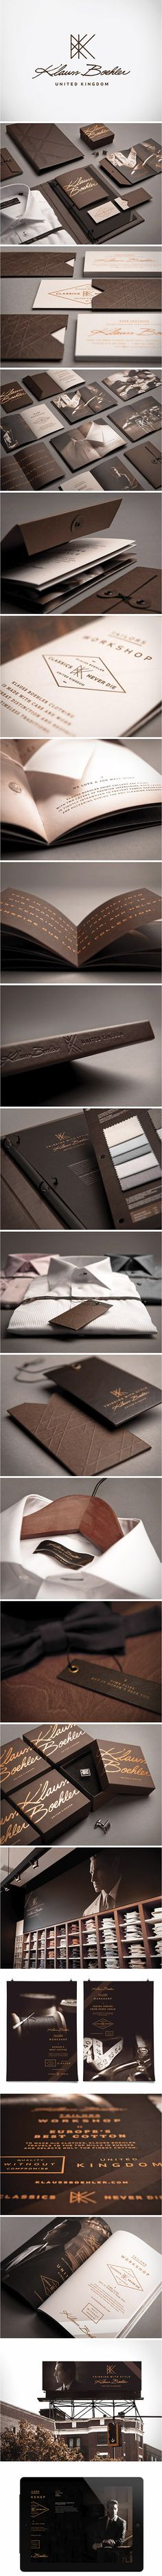 http://lg2boutique.com/en/work/474/klauss-boehler-branding